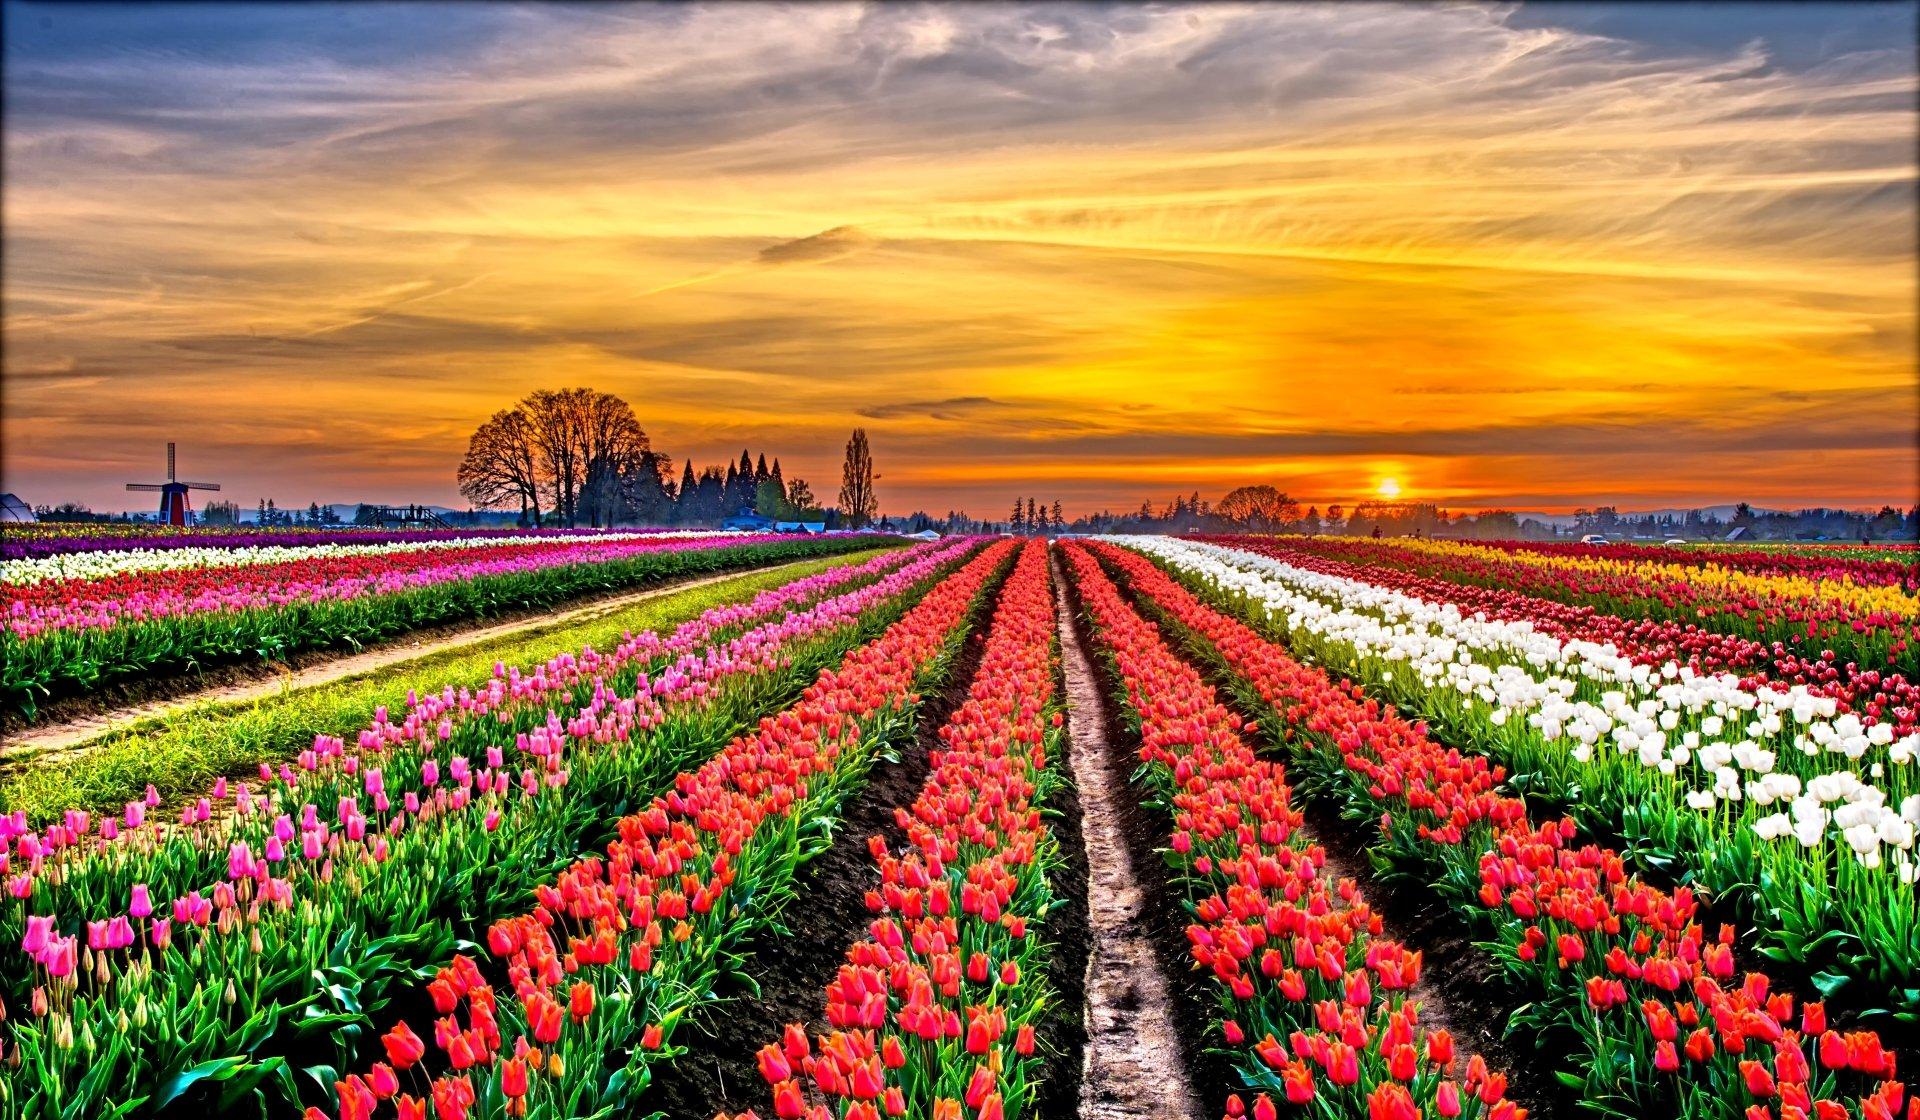 Spring Flowers Tulips Field Sunrise Grass Clouds: Tulip Field Sunset 5k Retina Ultra HD Wallpaper